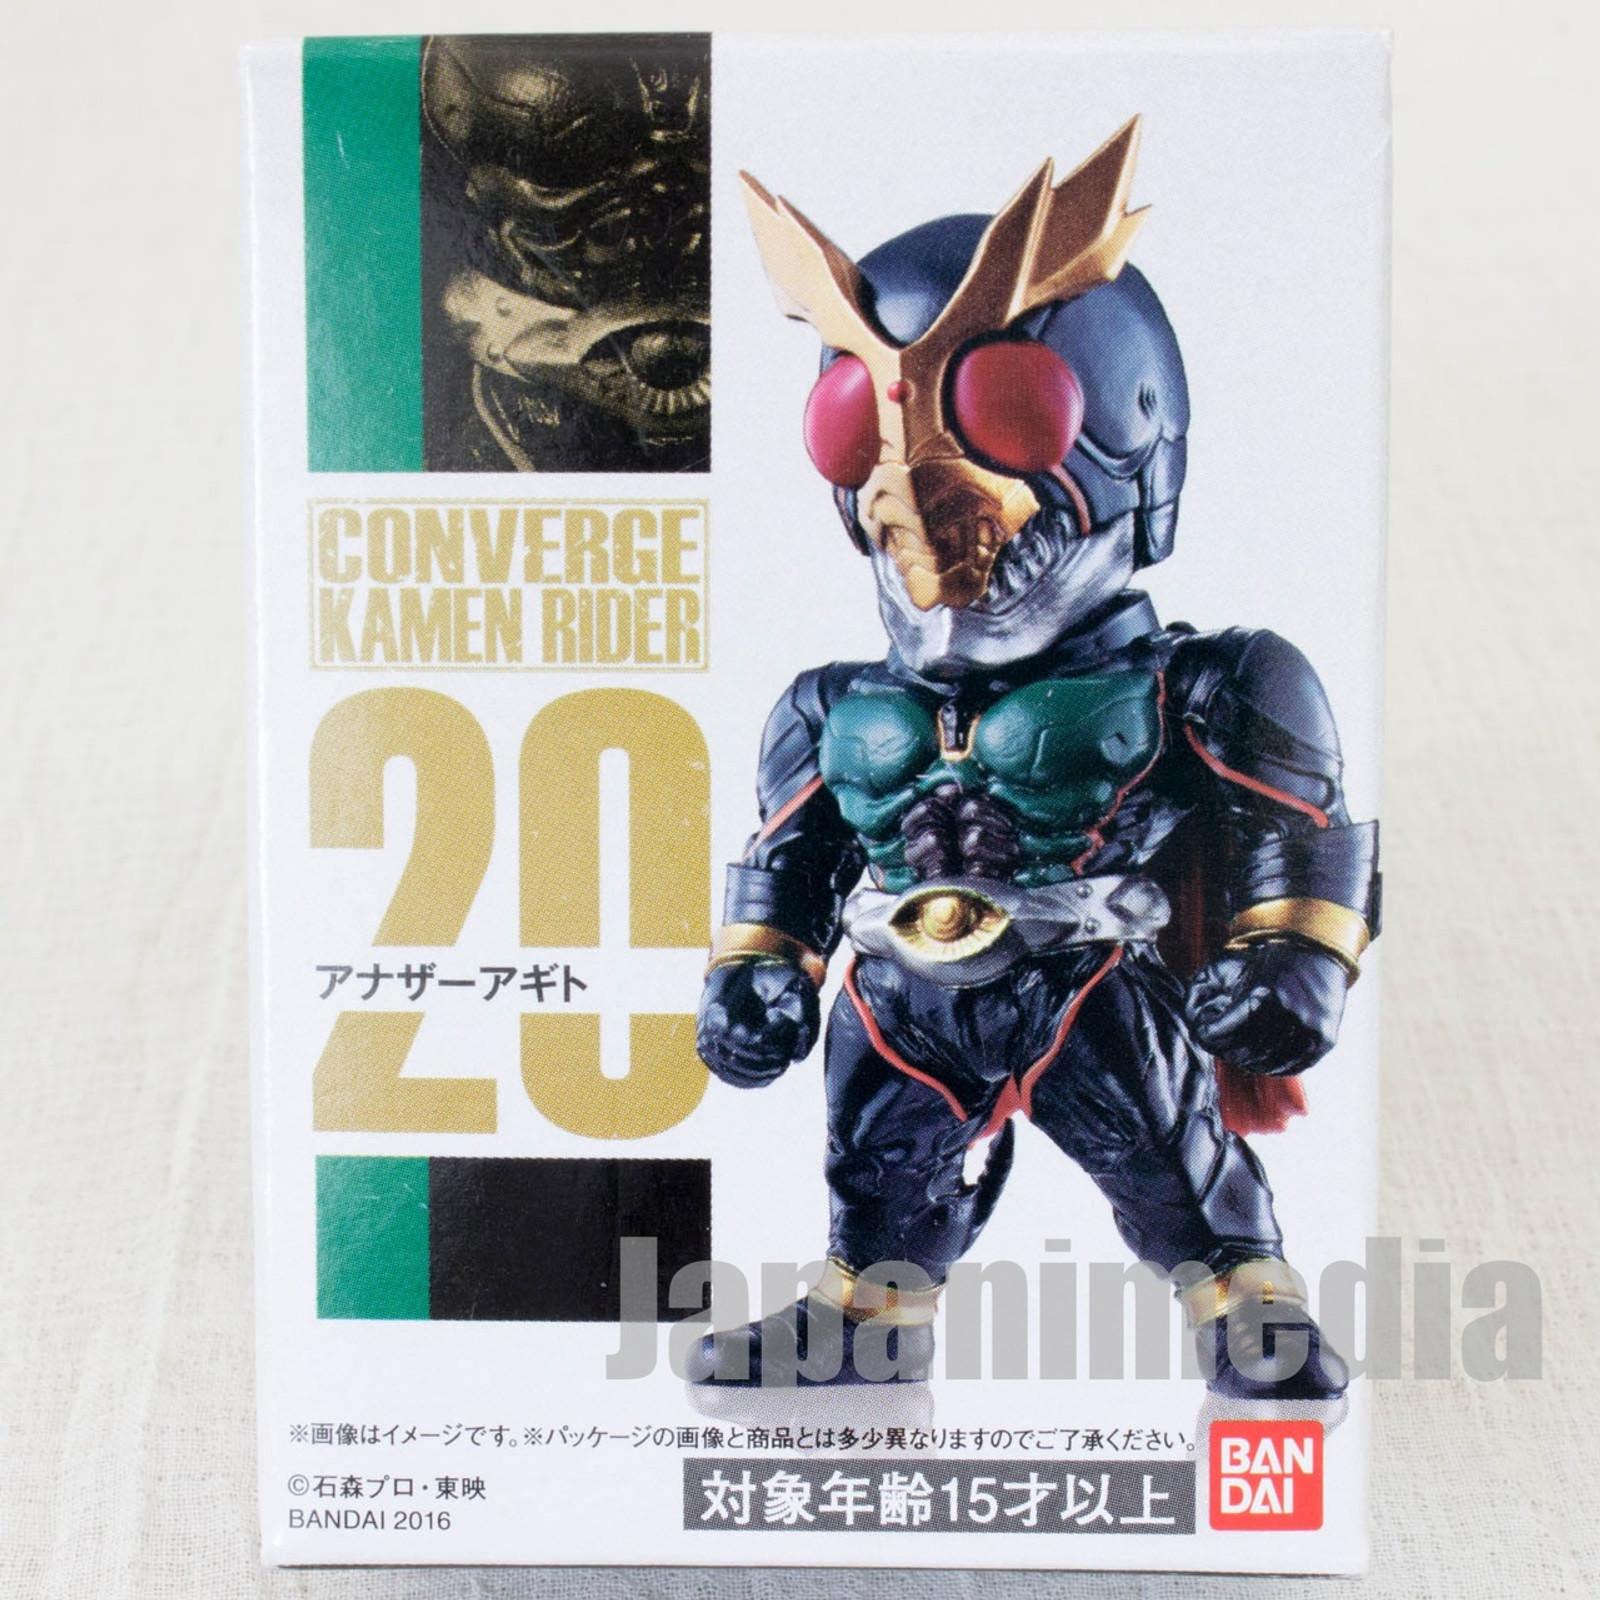 Kamen Rider AGITO Another AGITO Converge Kamen Rider #20 Mini Figure Bandai JAPAN TOKUSATSU